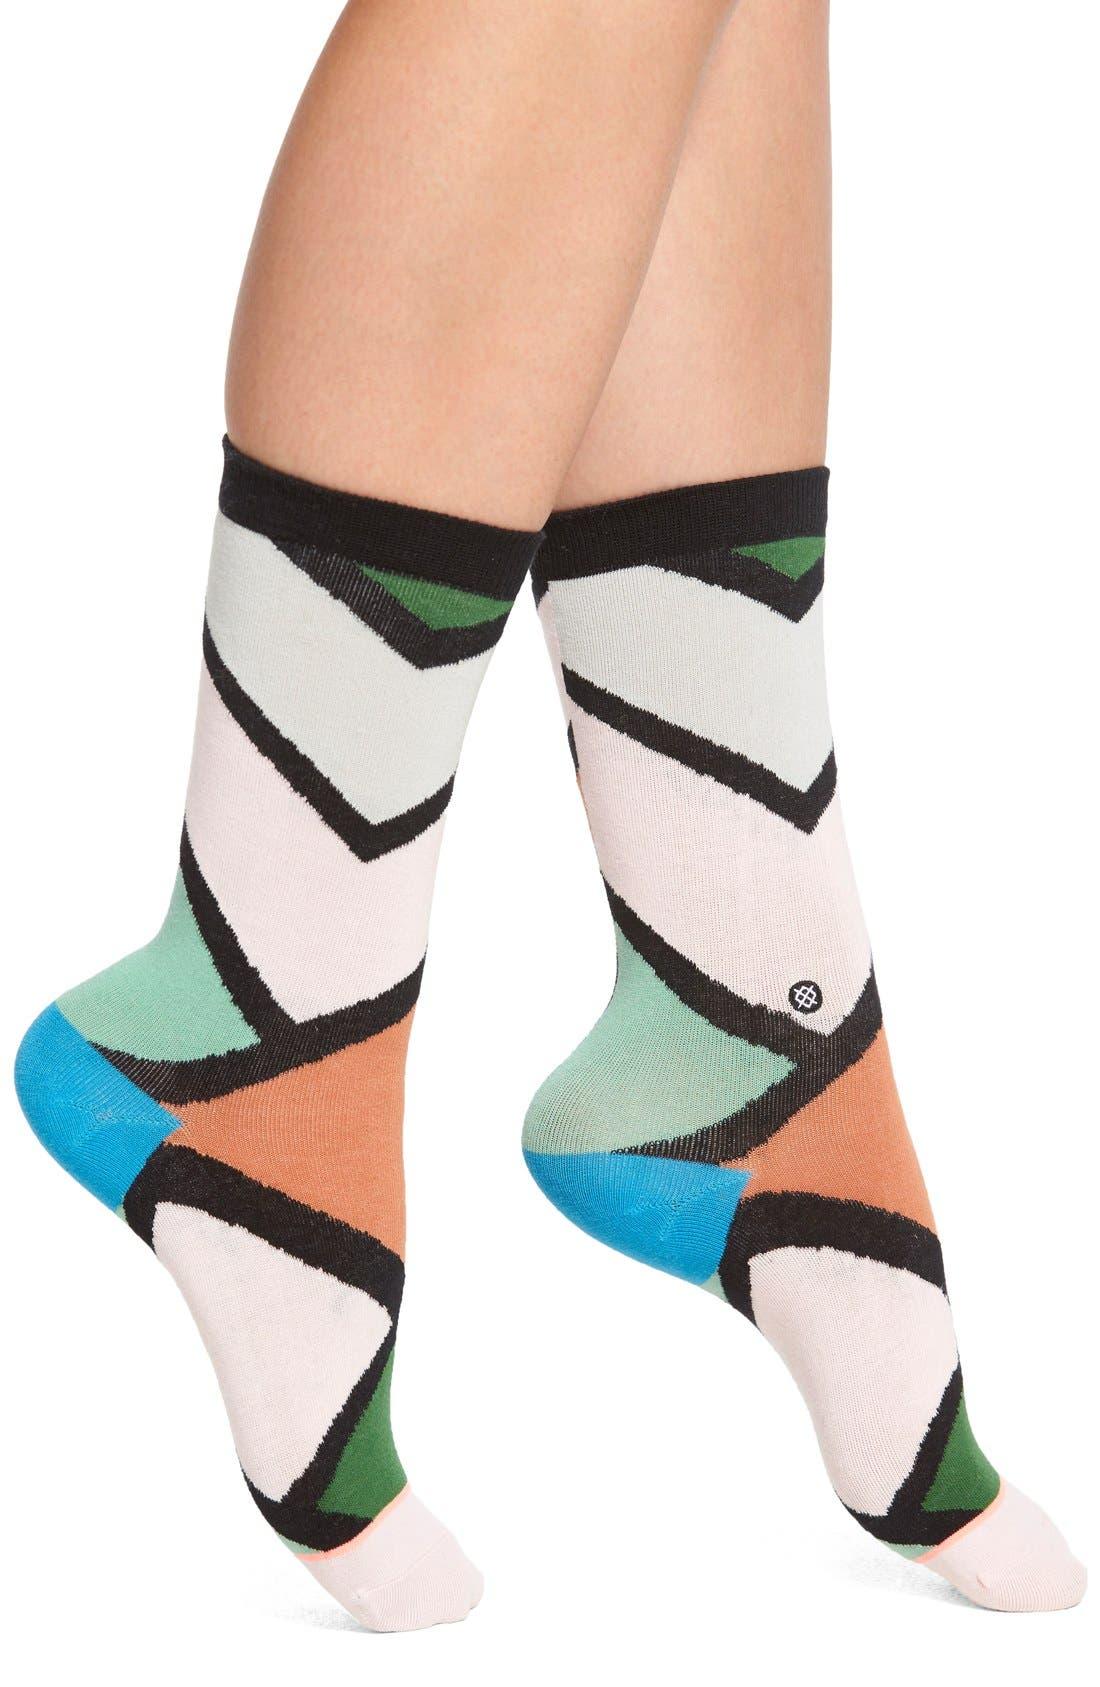 Alternate Image 1 Selected - Stance 'Steezy' Crew Socks